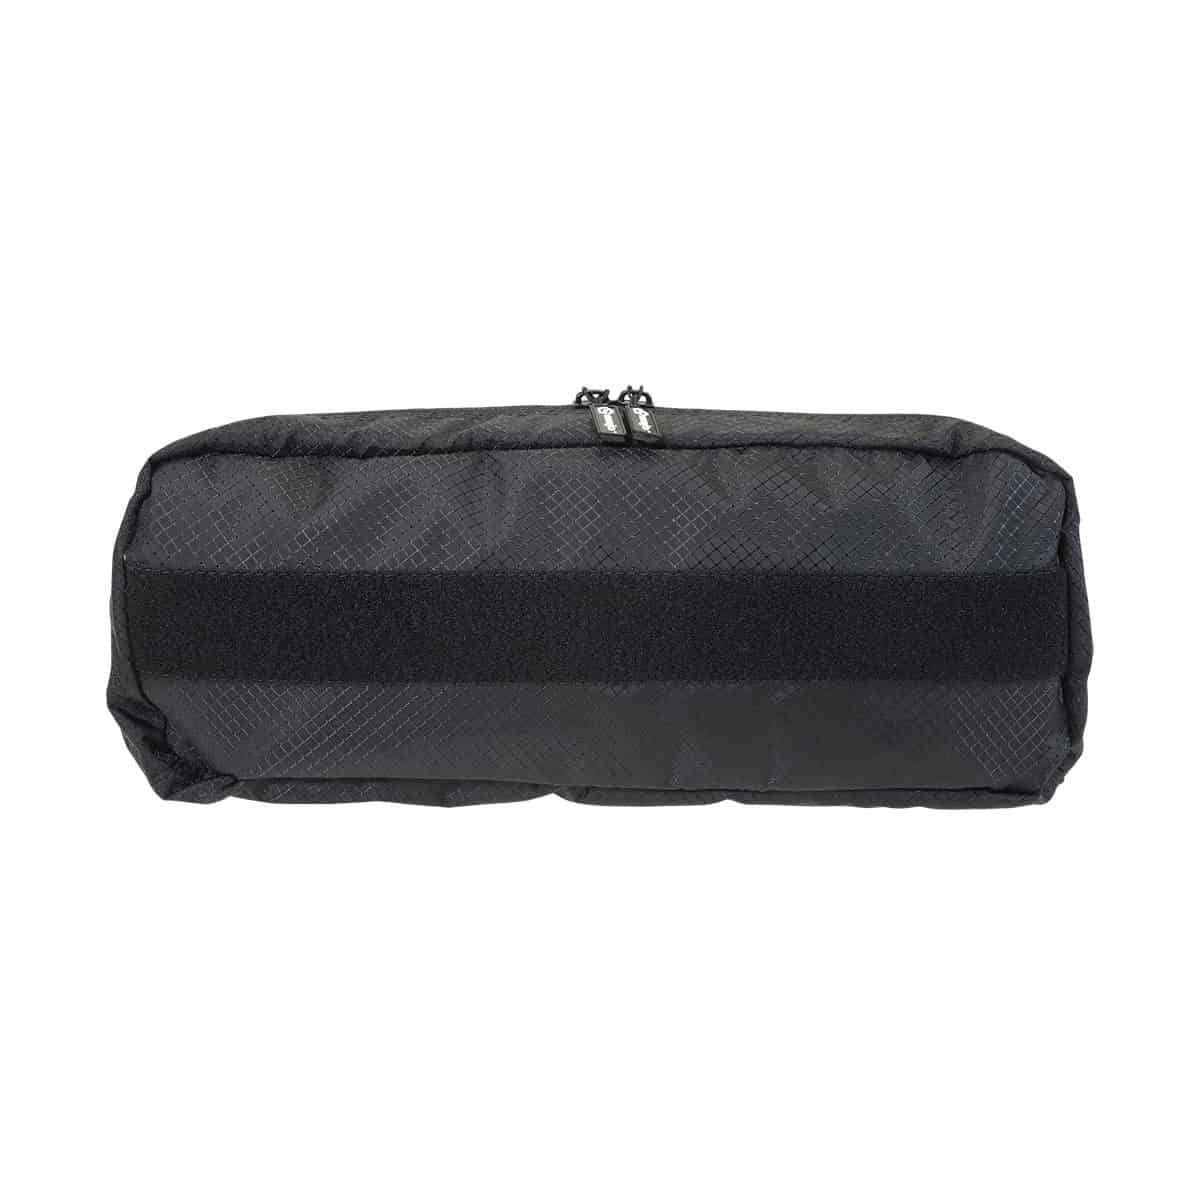 mojo responder beltpack closed front black